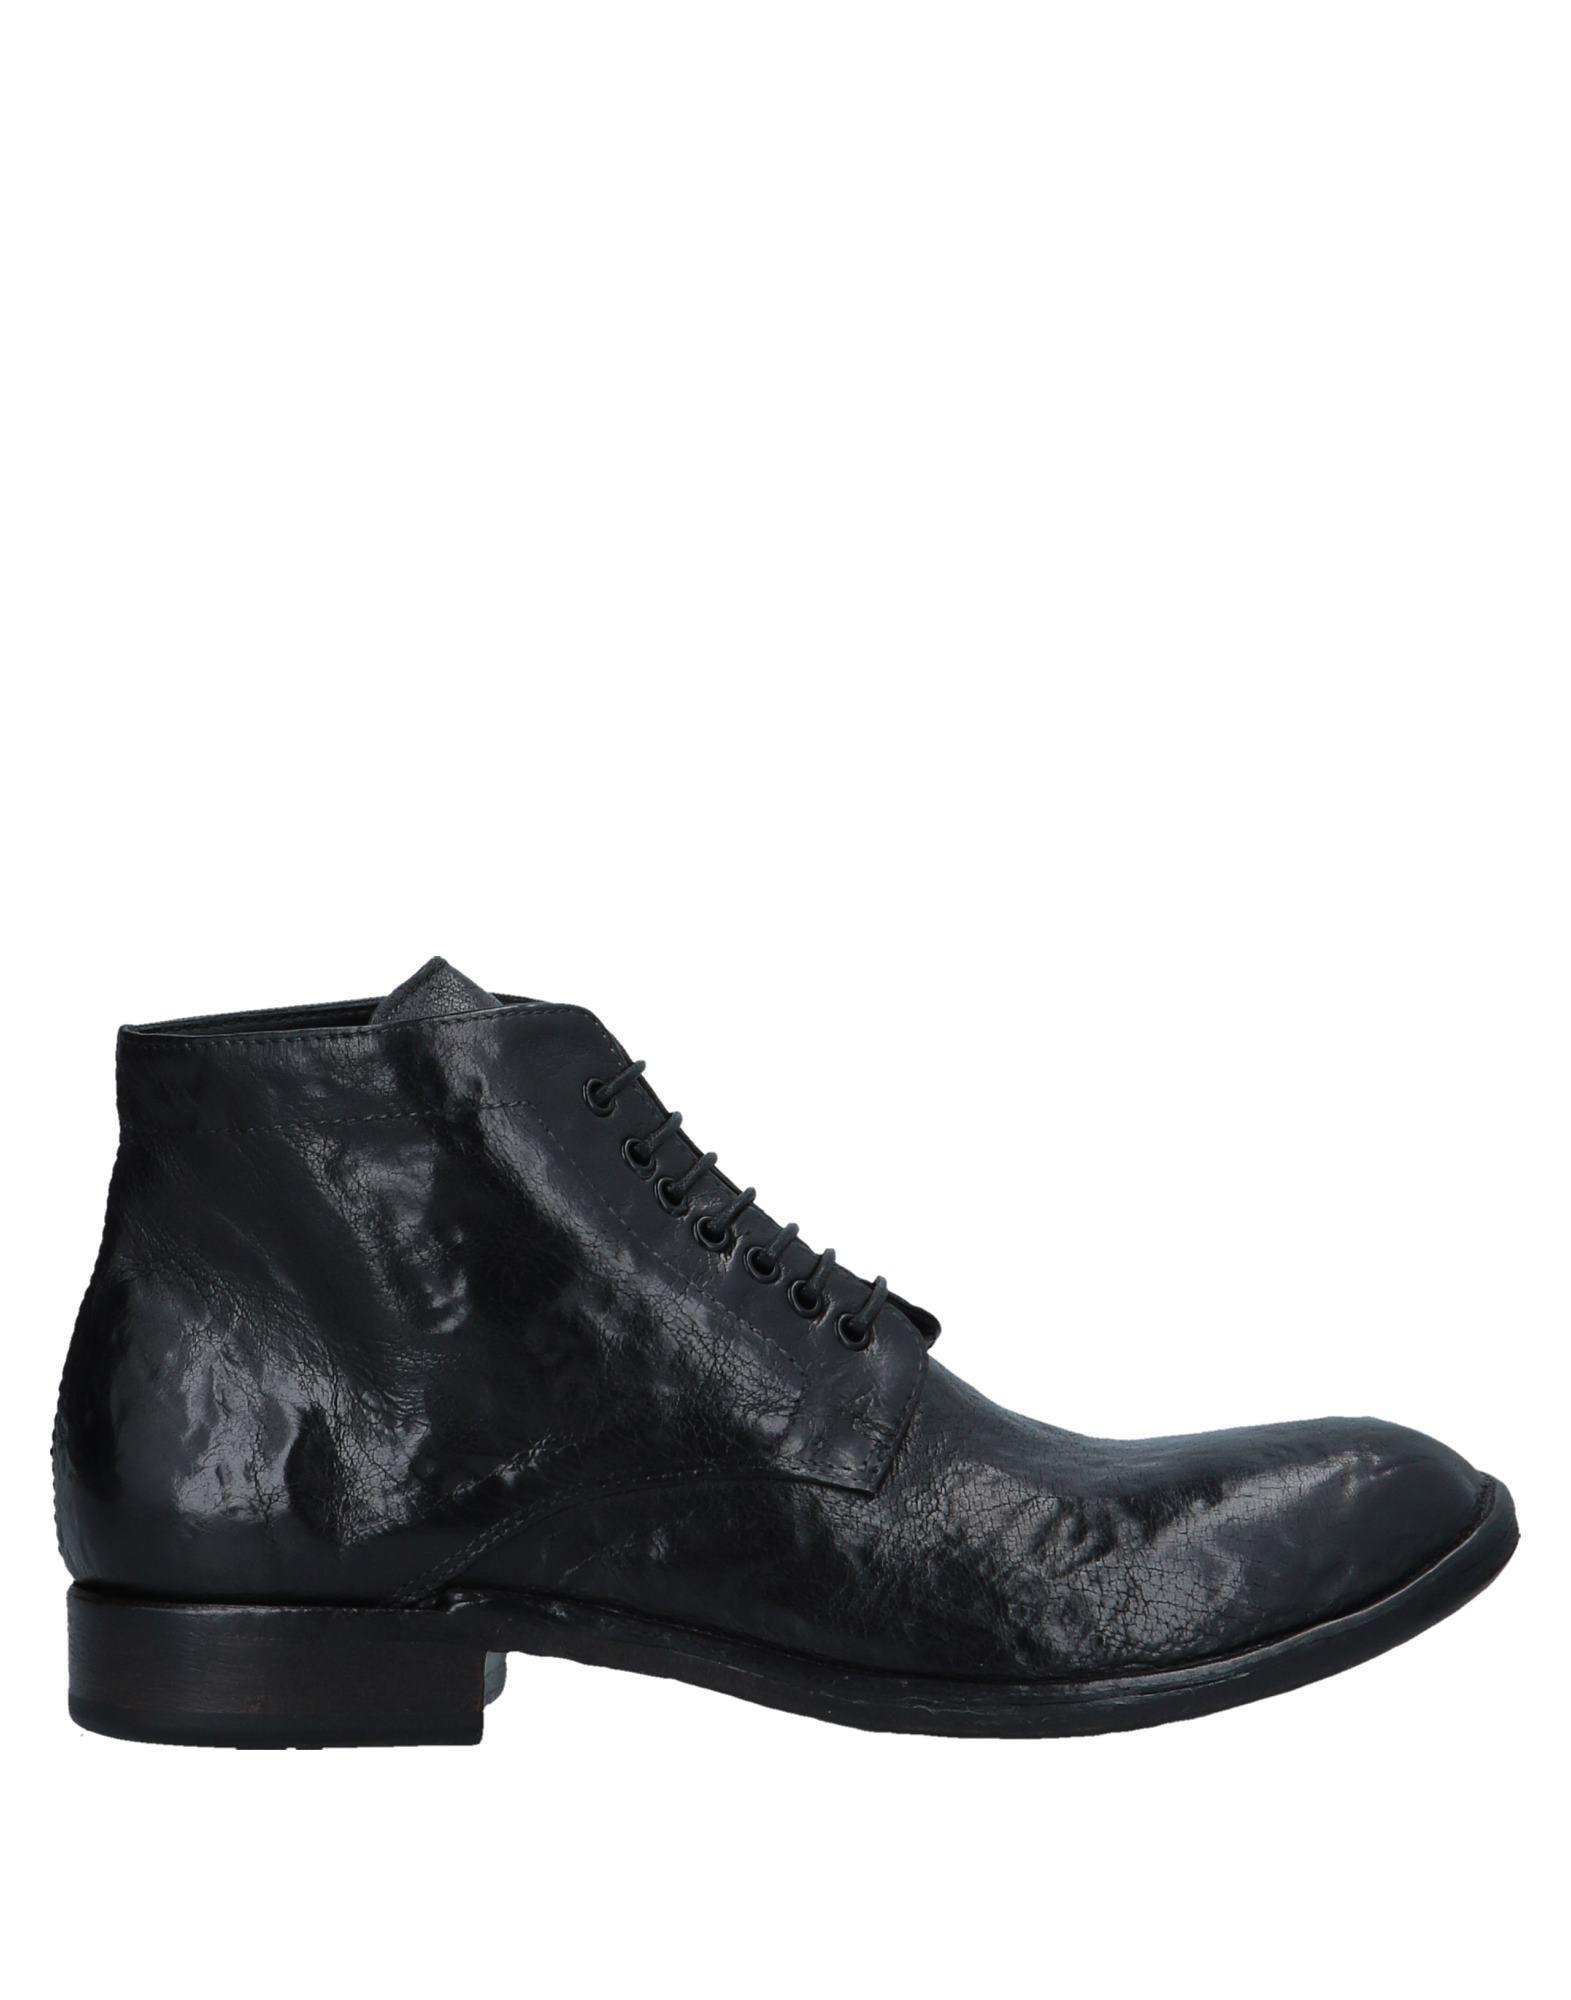 Bottine Preventi Femme Chaussures - Bottines Preventi Noir Chaussures Femme femme pas cher homme et femme d8d581